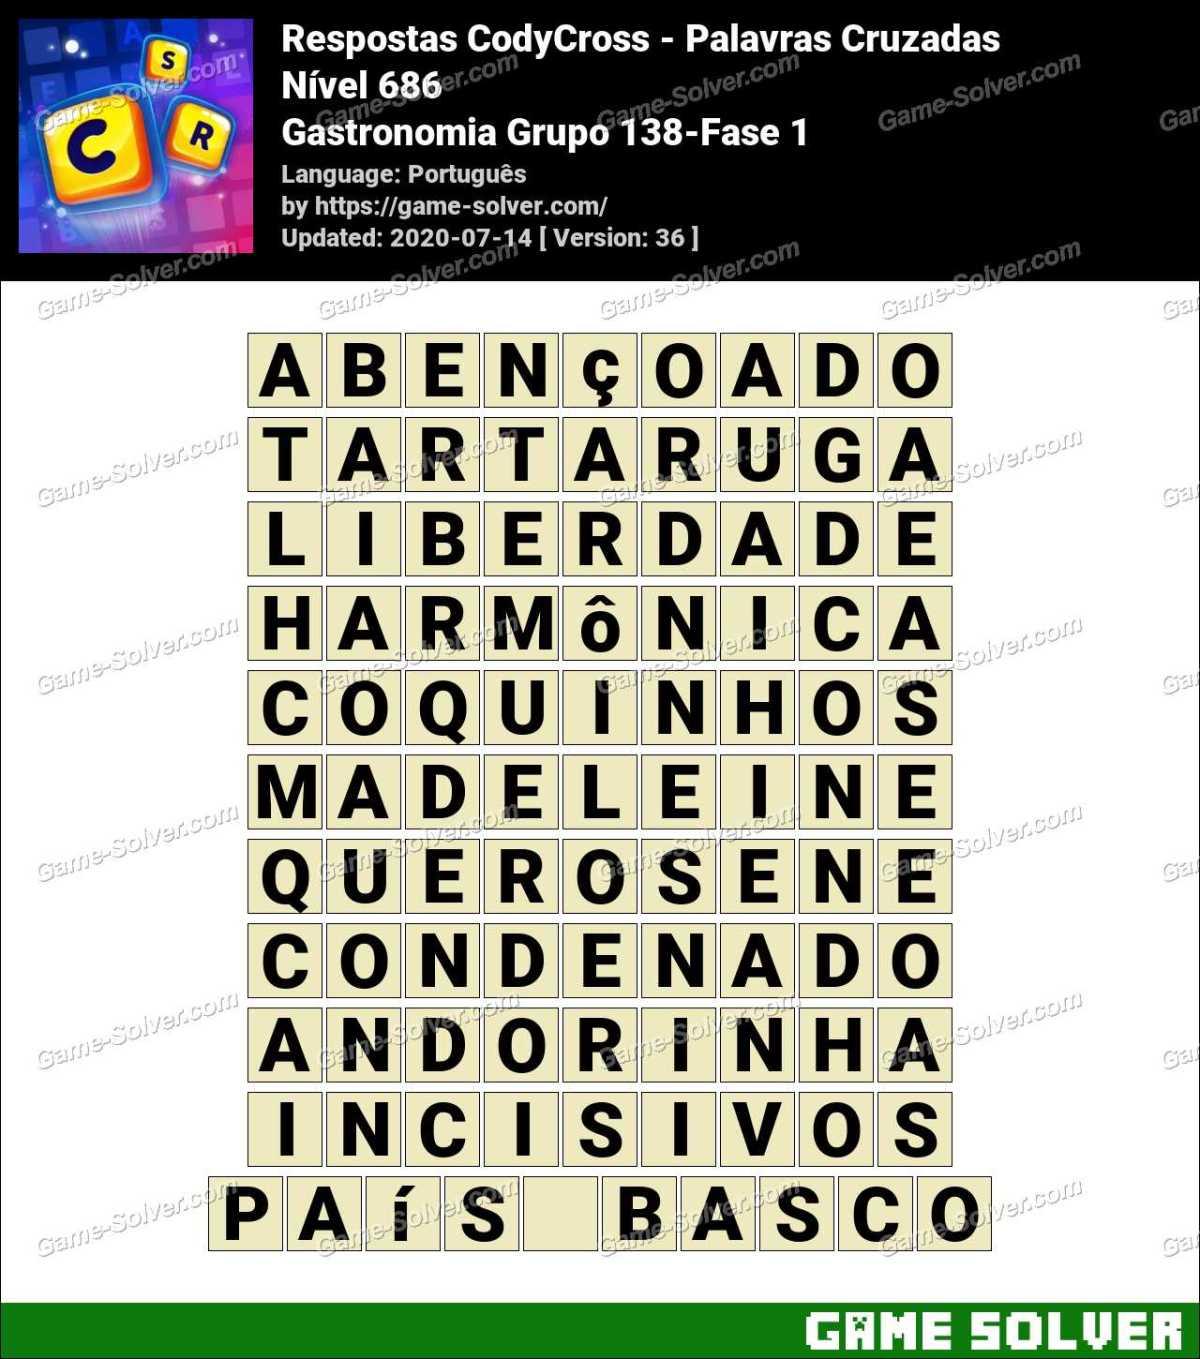 Respostas CodyCross Gastronomia Grupo 138-Fase 1